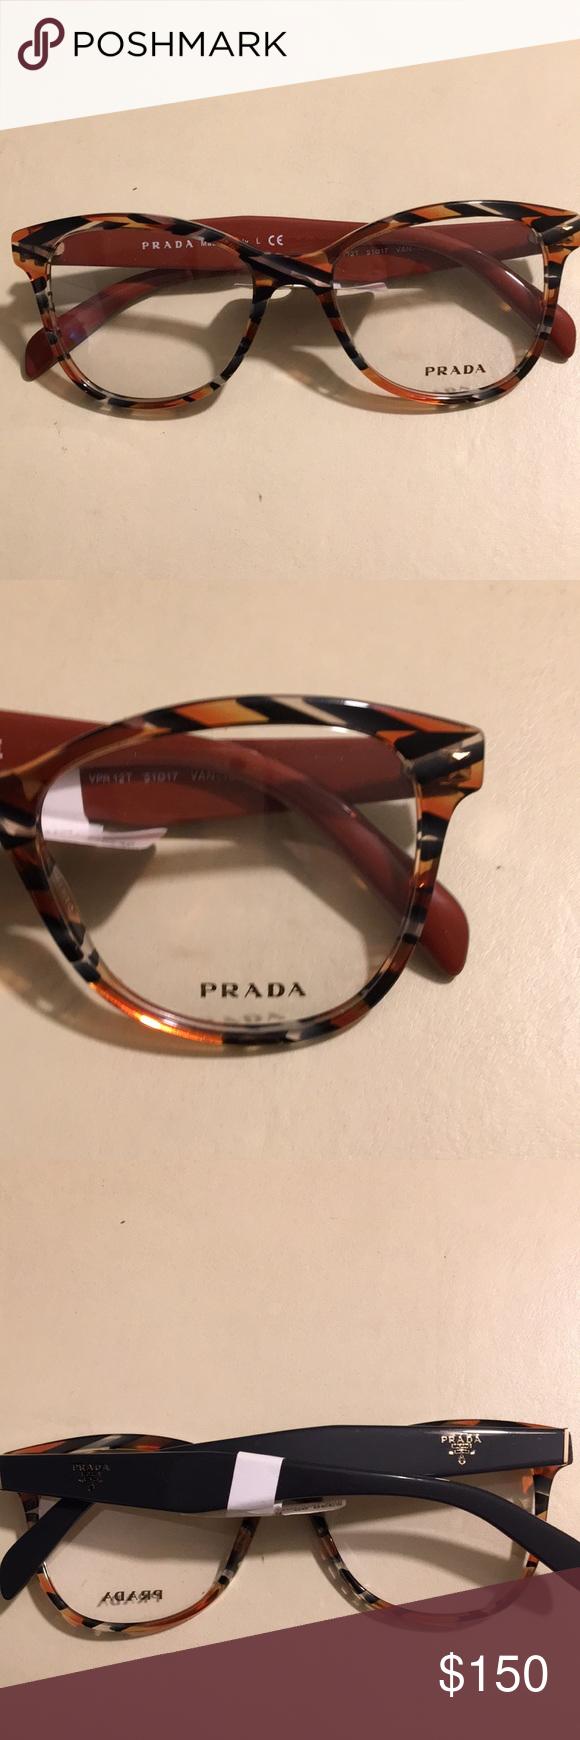 6bbad8c42cd2 100% authentic Prada prescription glasses Brand new Prada prescription  glasses Prada Accessories Glasses